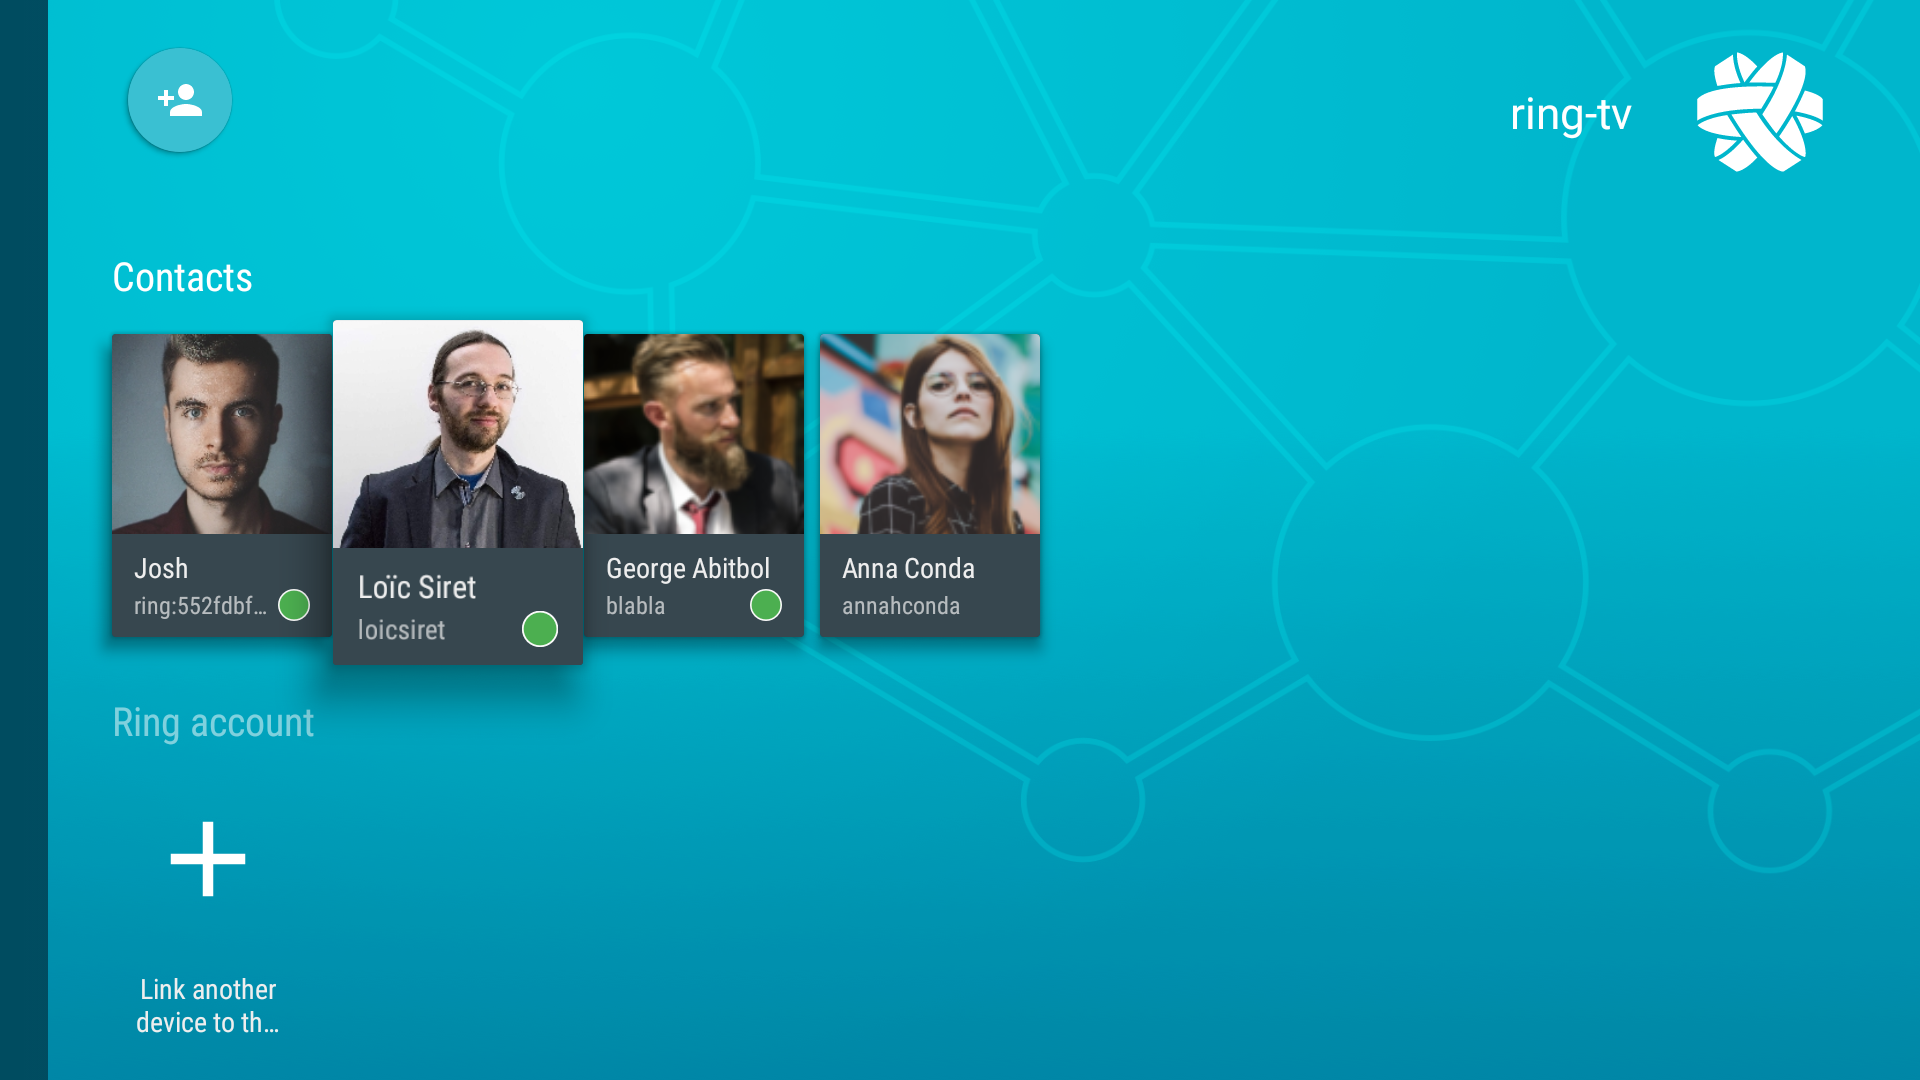 androidtv-details-screenshot